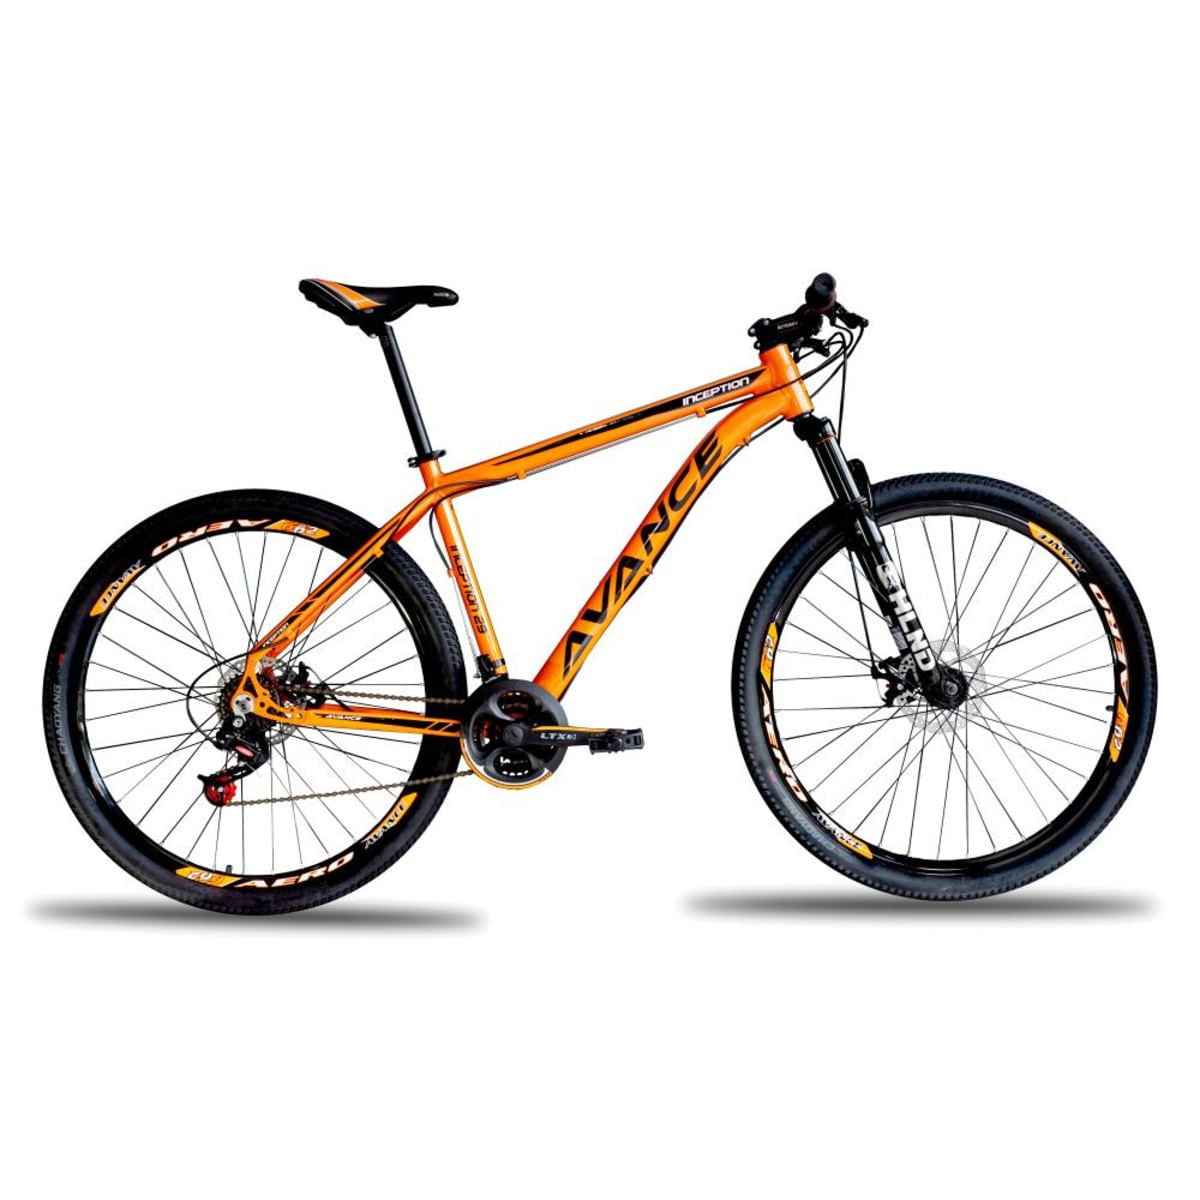 Bicicleta Avance Bike Tropper Aro 29 Susp. Dianteira 21 Marchas - Laranja/preto